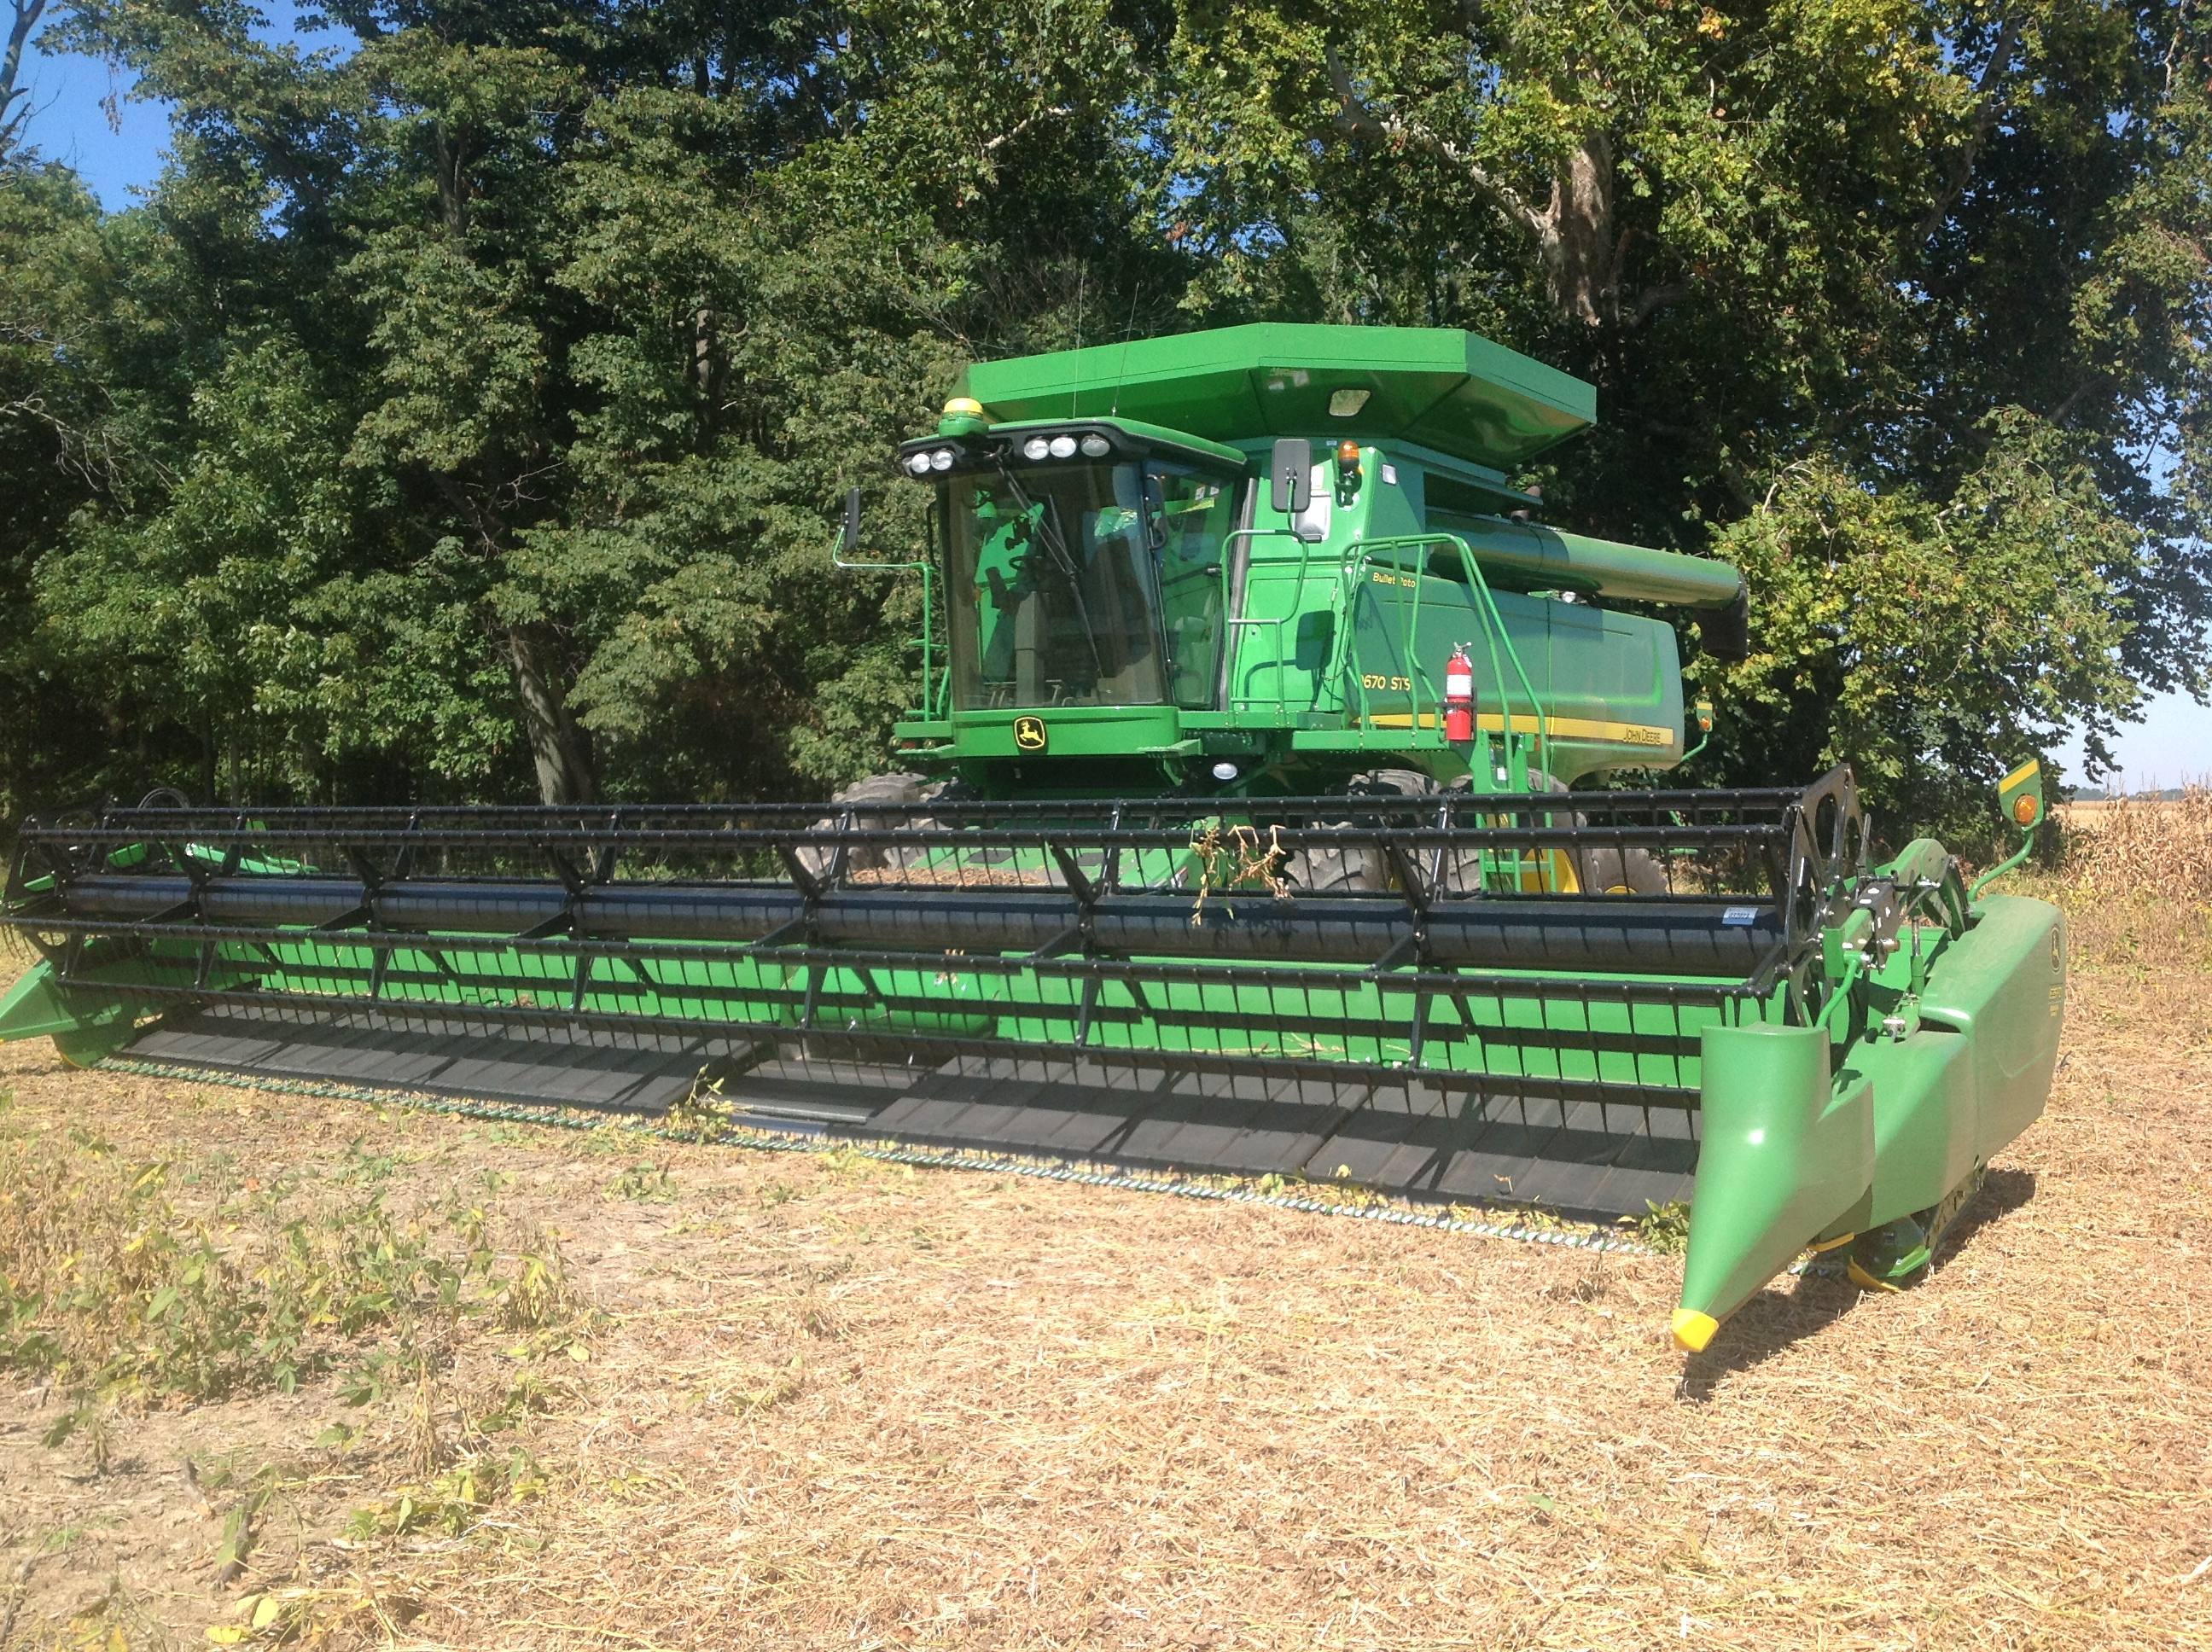 What is a Flex Draper? - The Farmer's Life